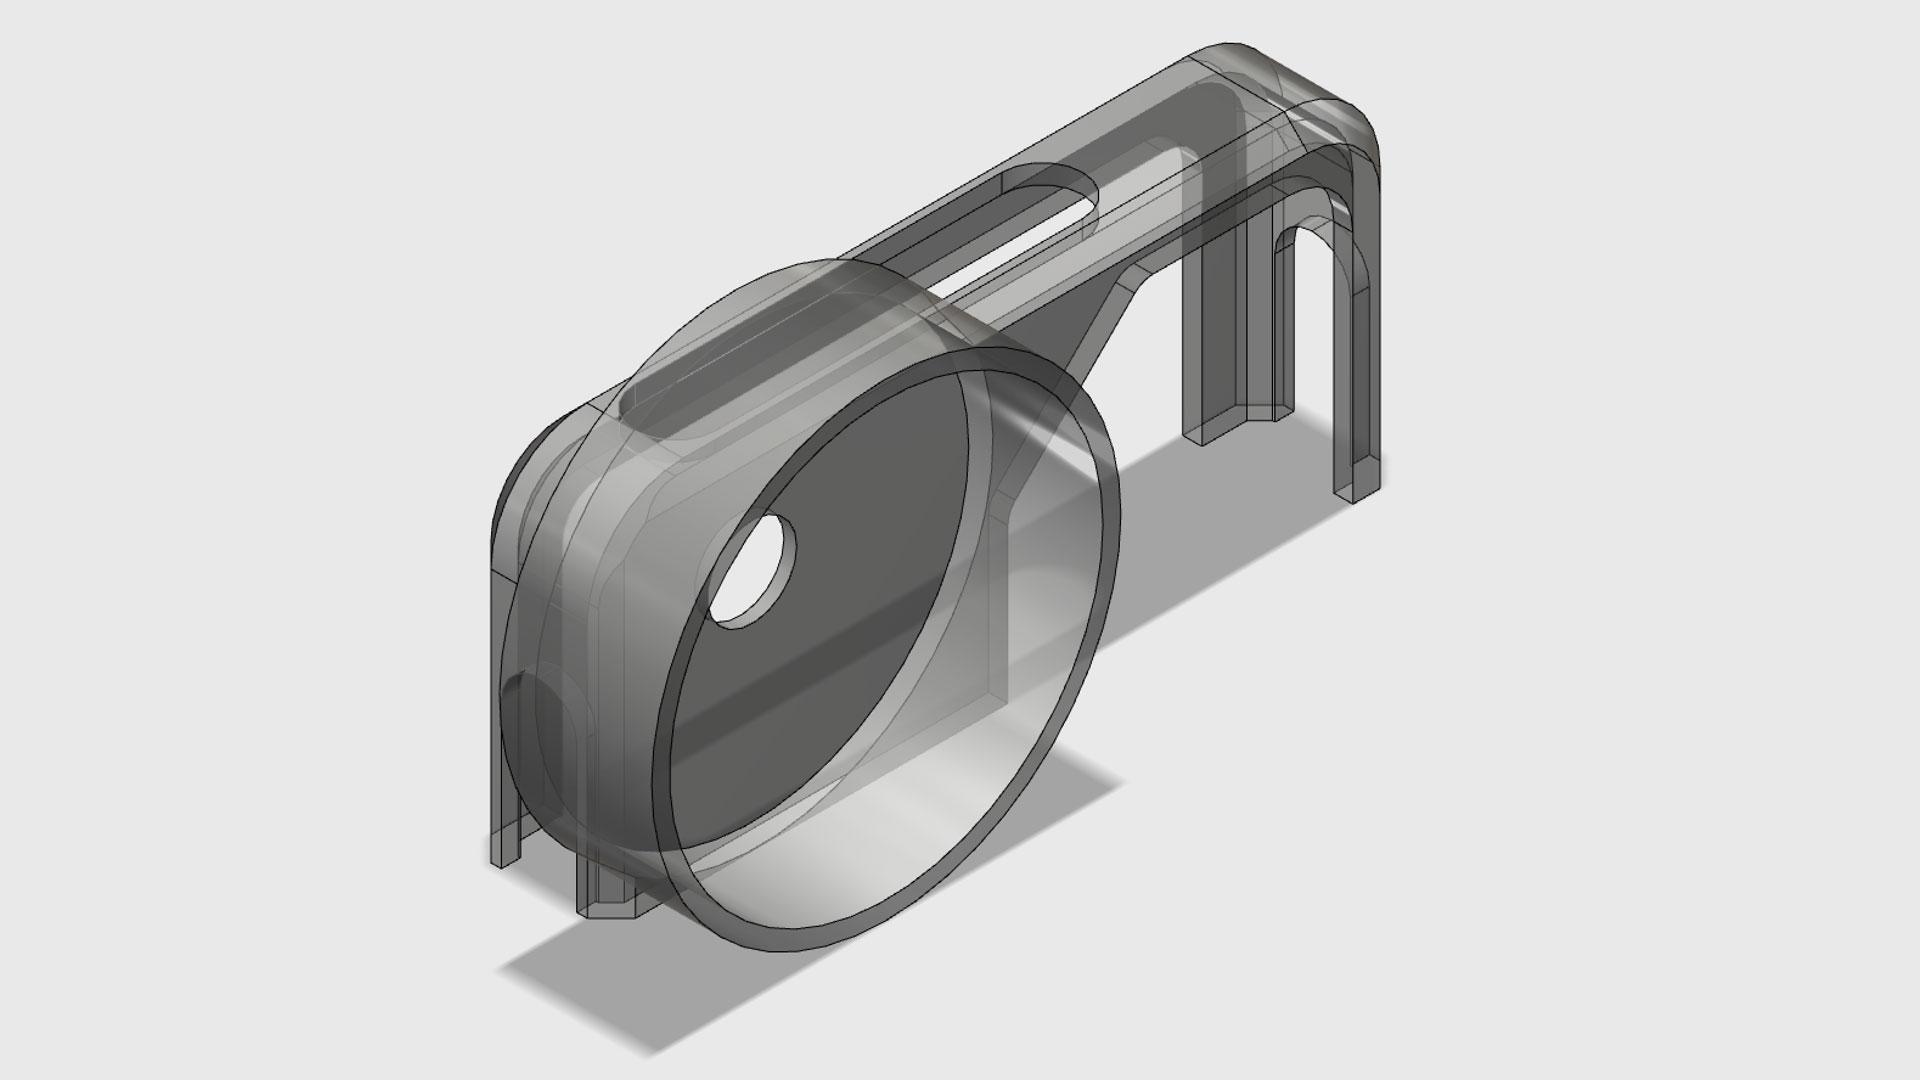 3d_printing_3dp-iphone-adapter.jpg